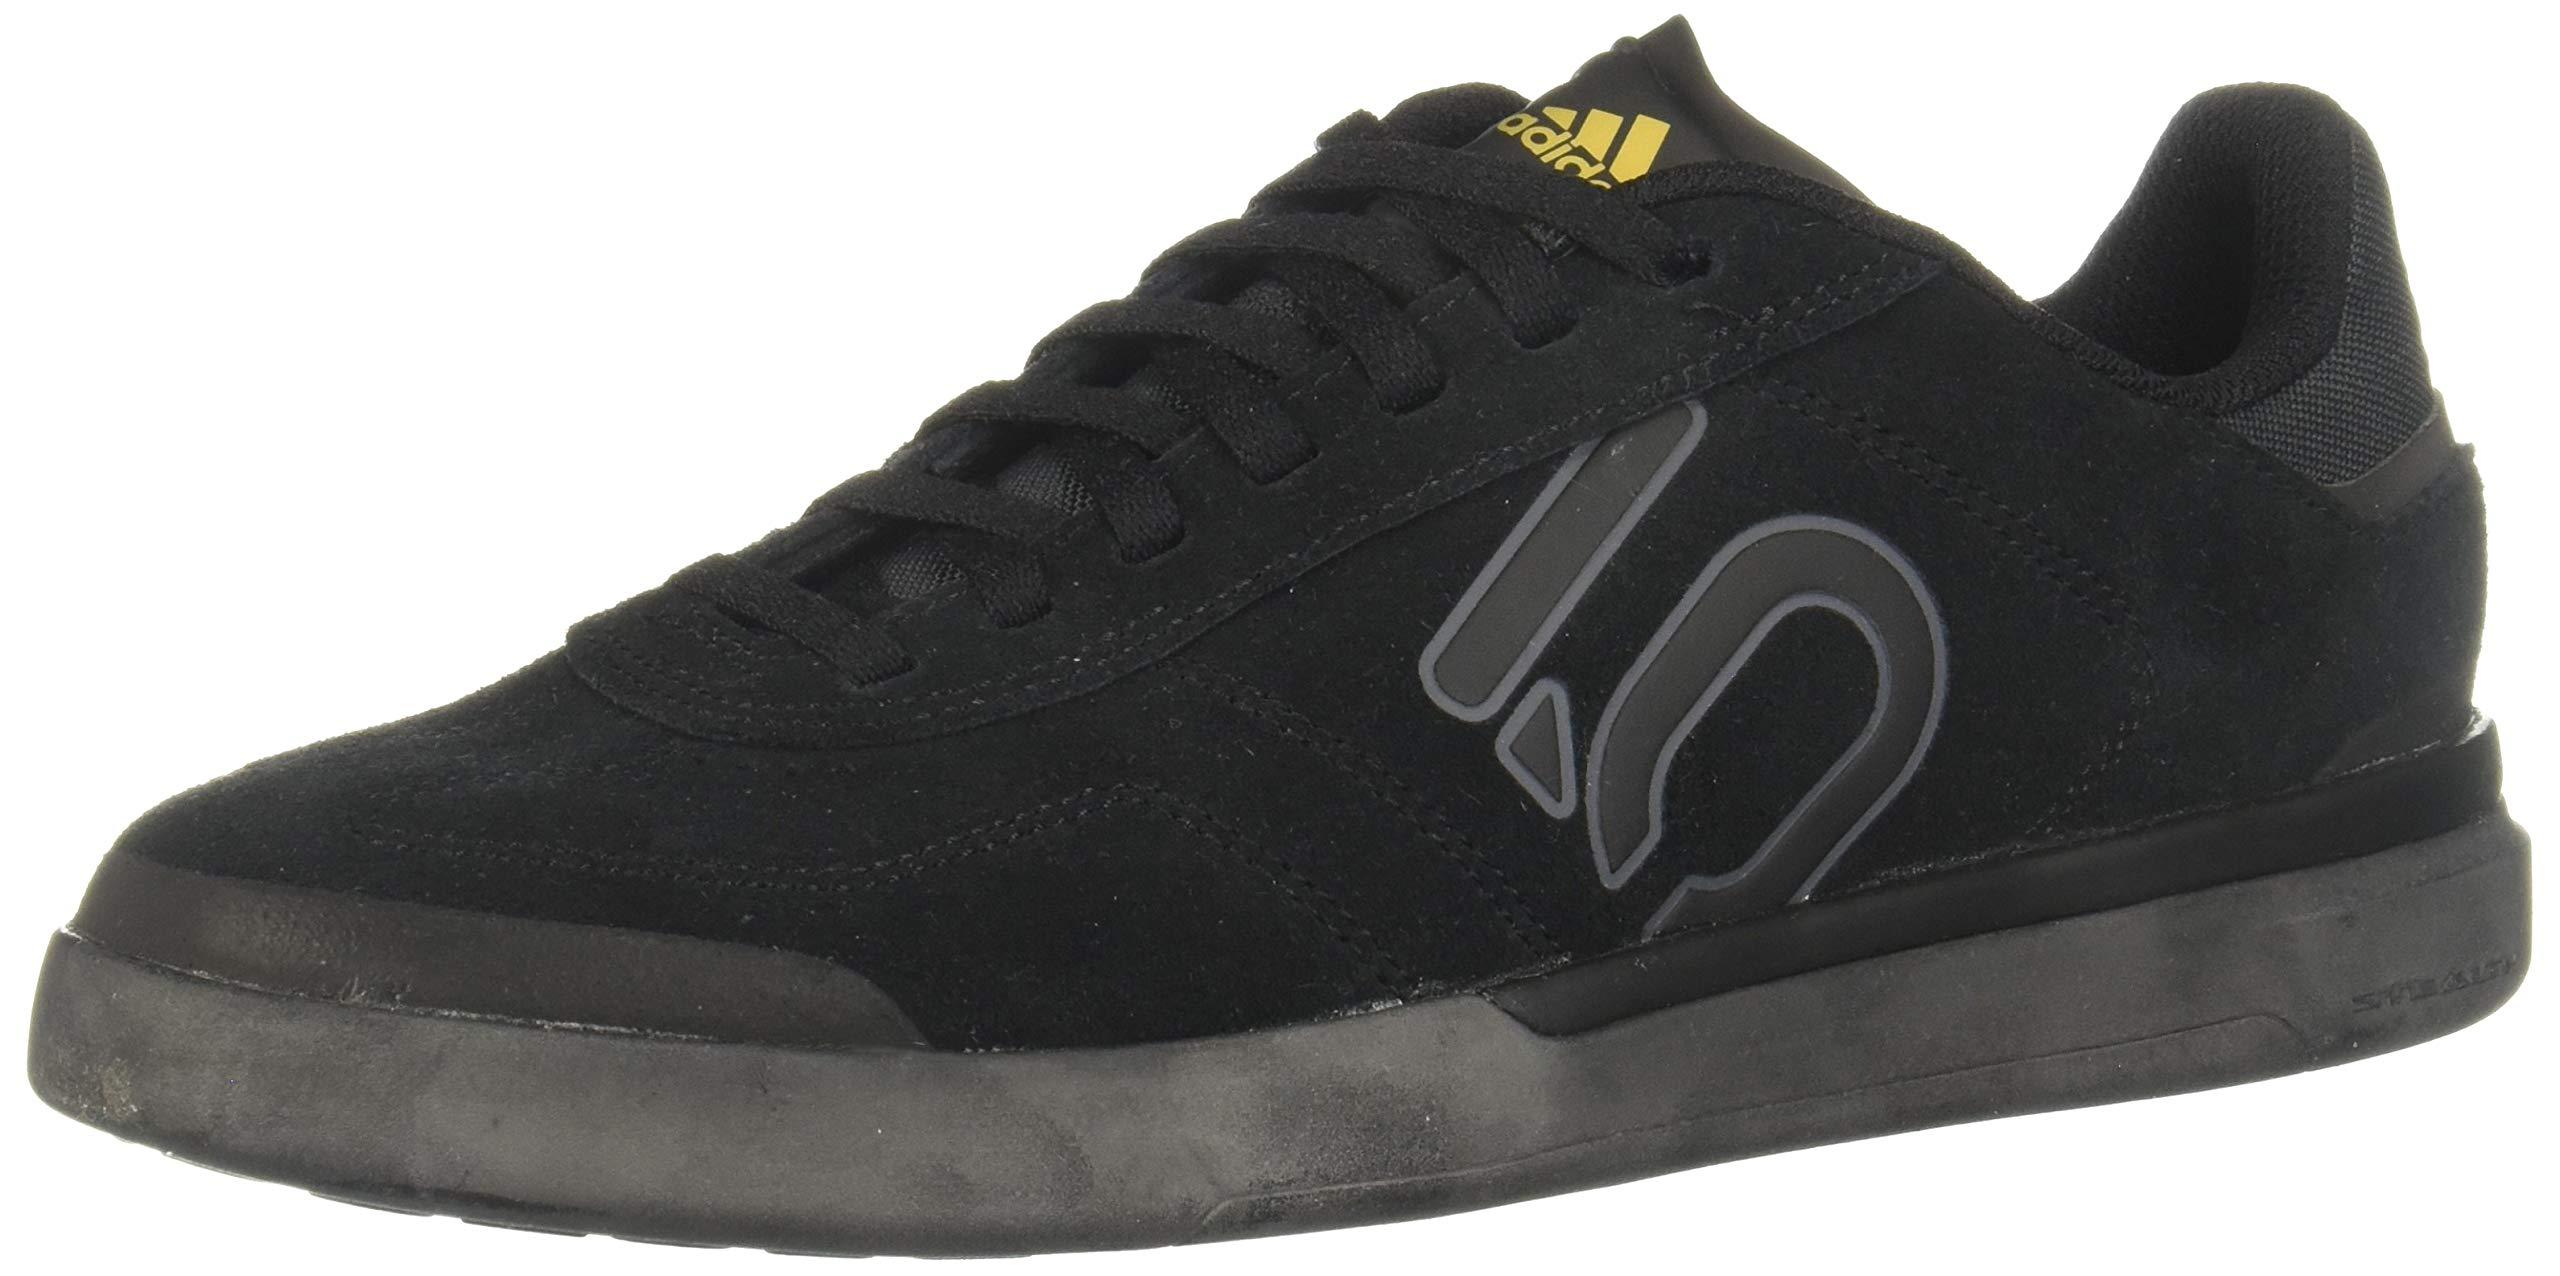 adidas Damen Sleuth DLX Mountain Biking Shoe, Core Black/Grey/Matte Gold, 40 EU